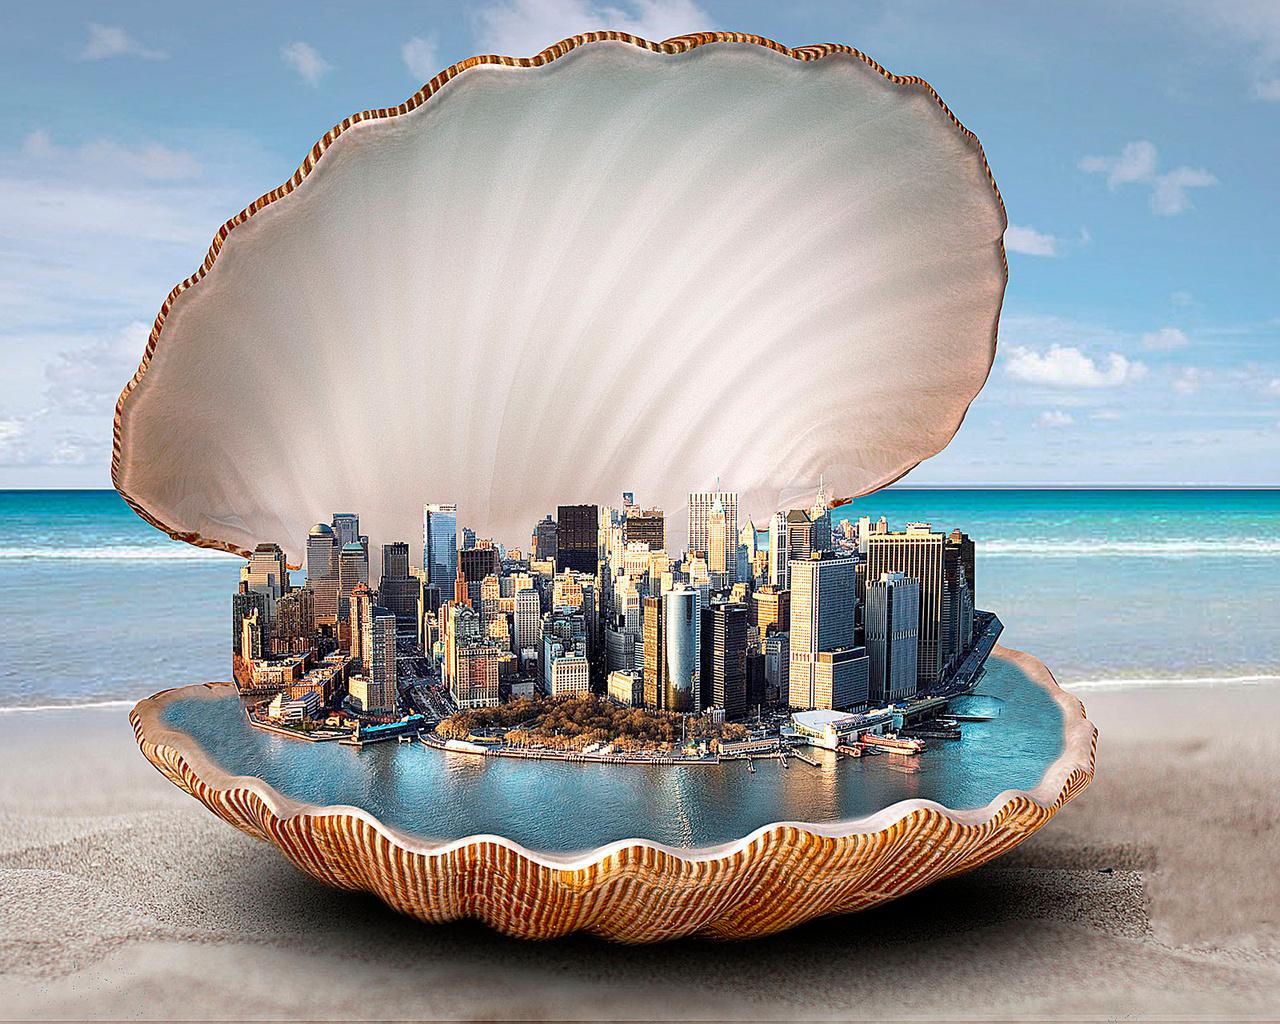 пляж, море, город, раковина, фотоманипуляция